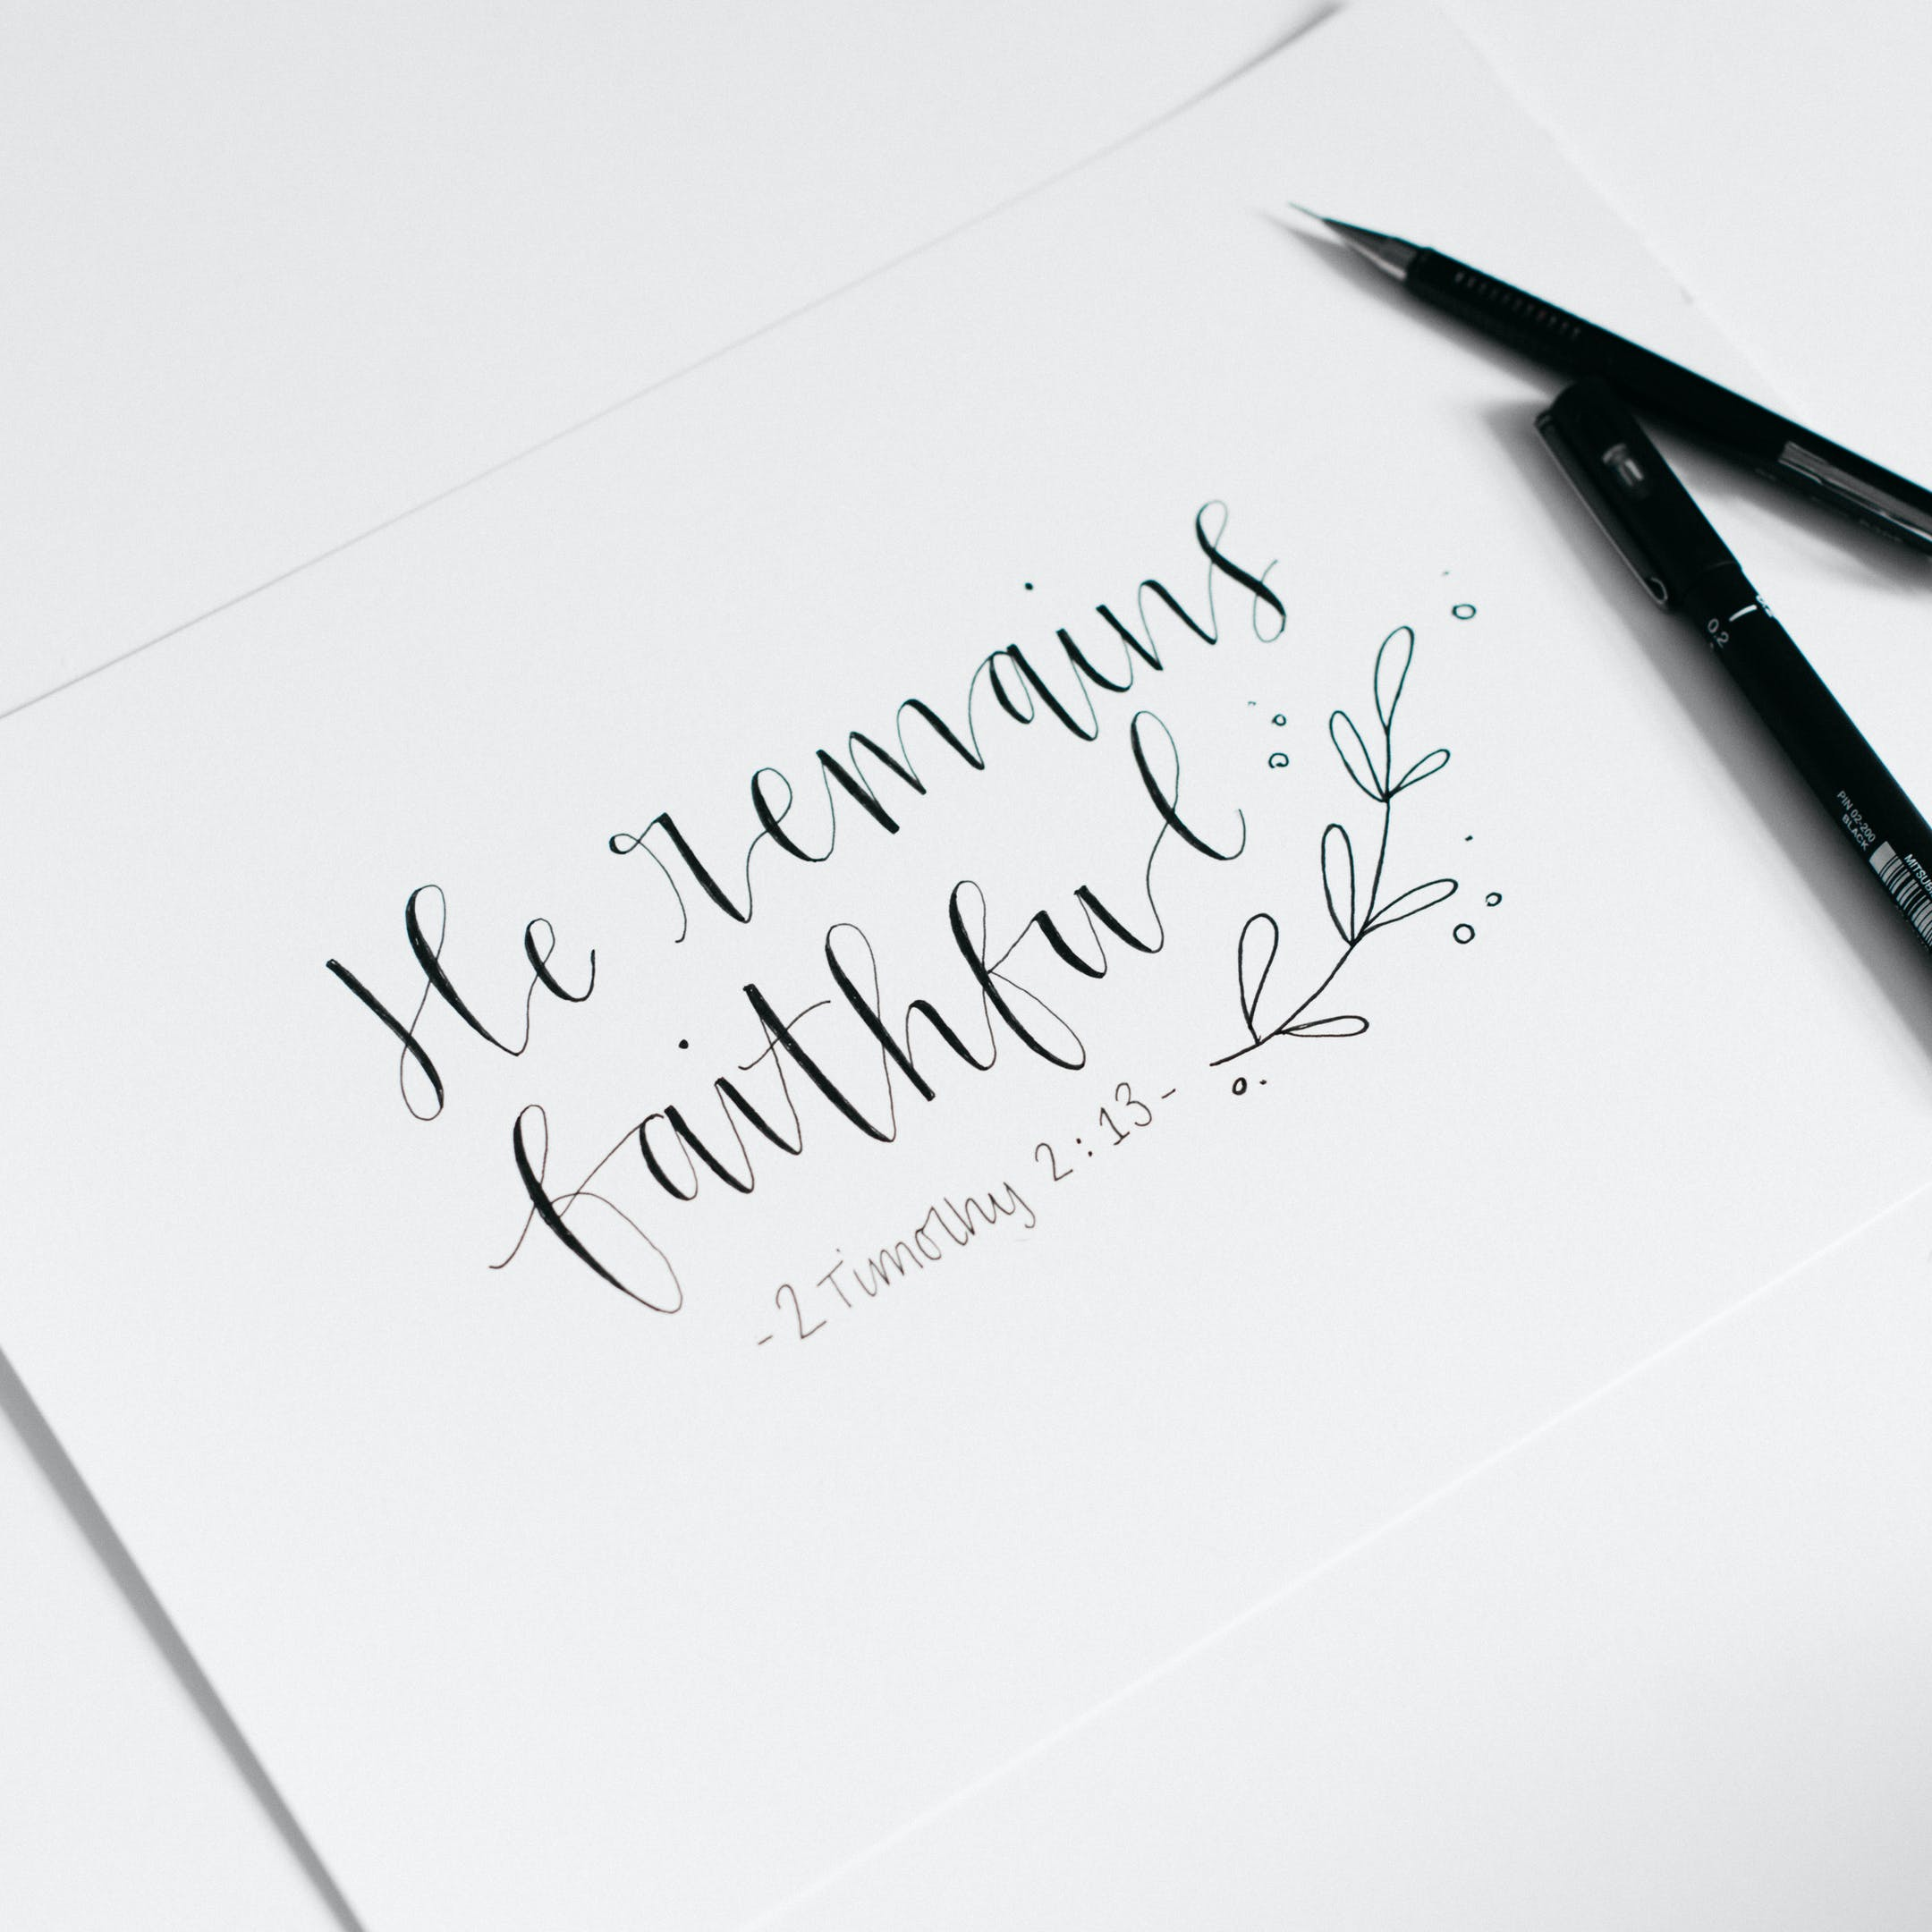 2 Timothy 2:13 Calligraphy Print - He Remains Faithful - Kate Hanks Art